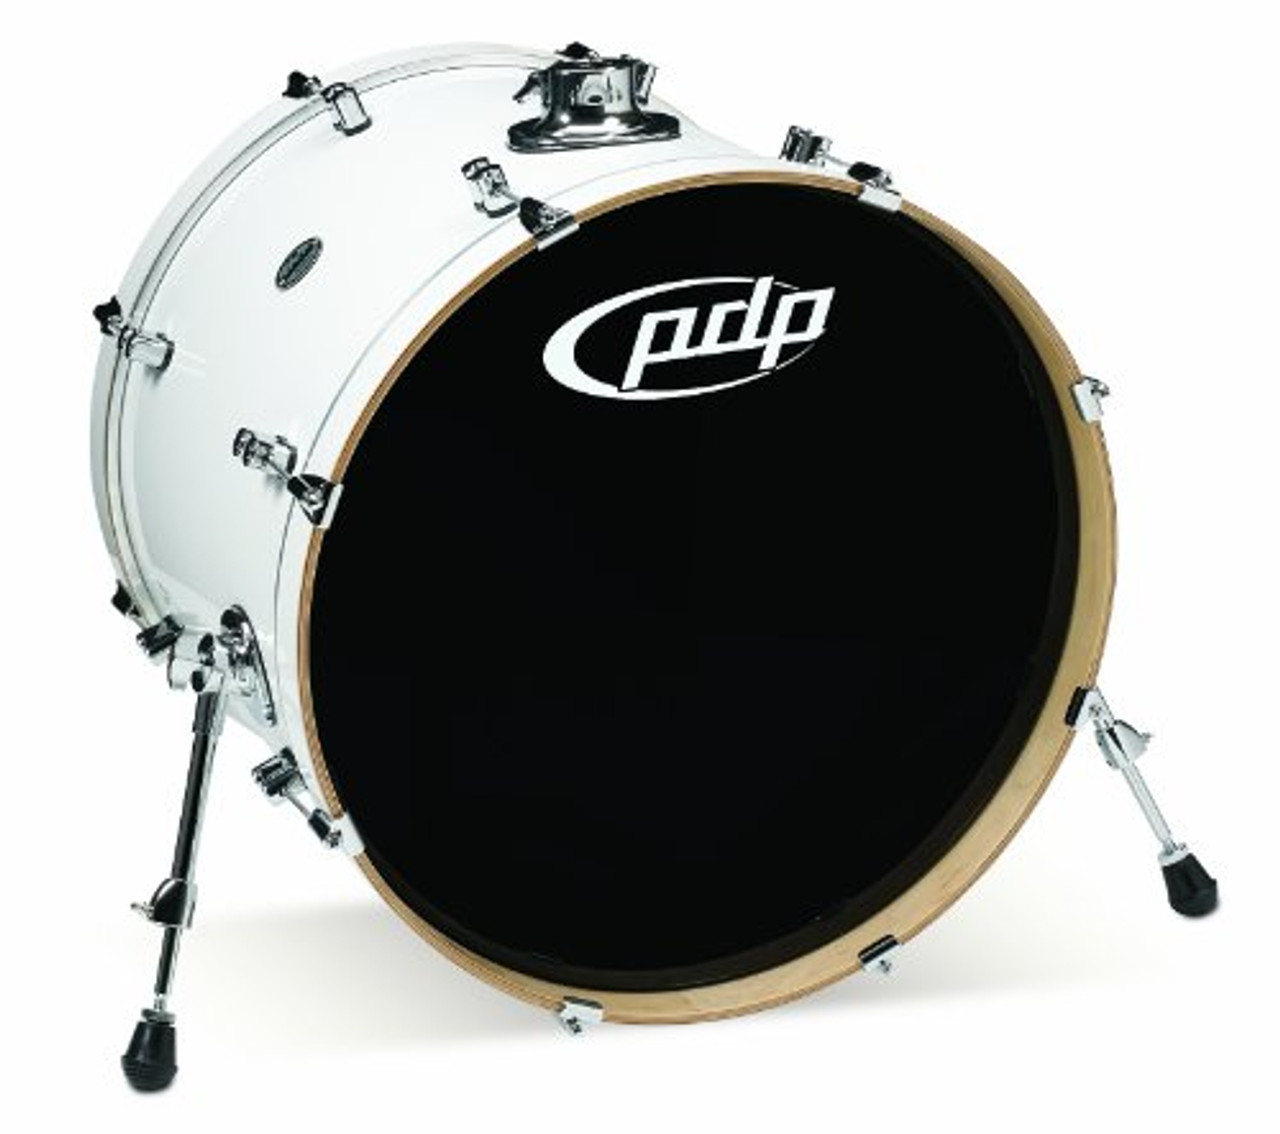 Drum Workshop Pearlescent White - Chrm Hw 18x22